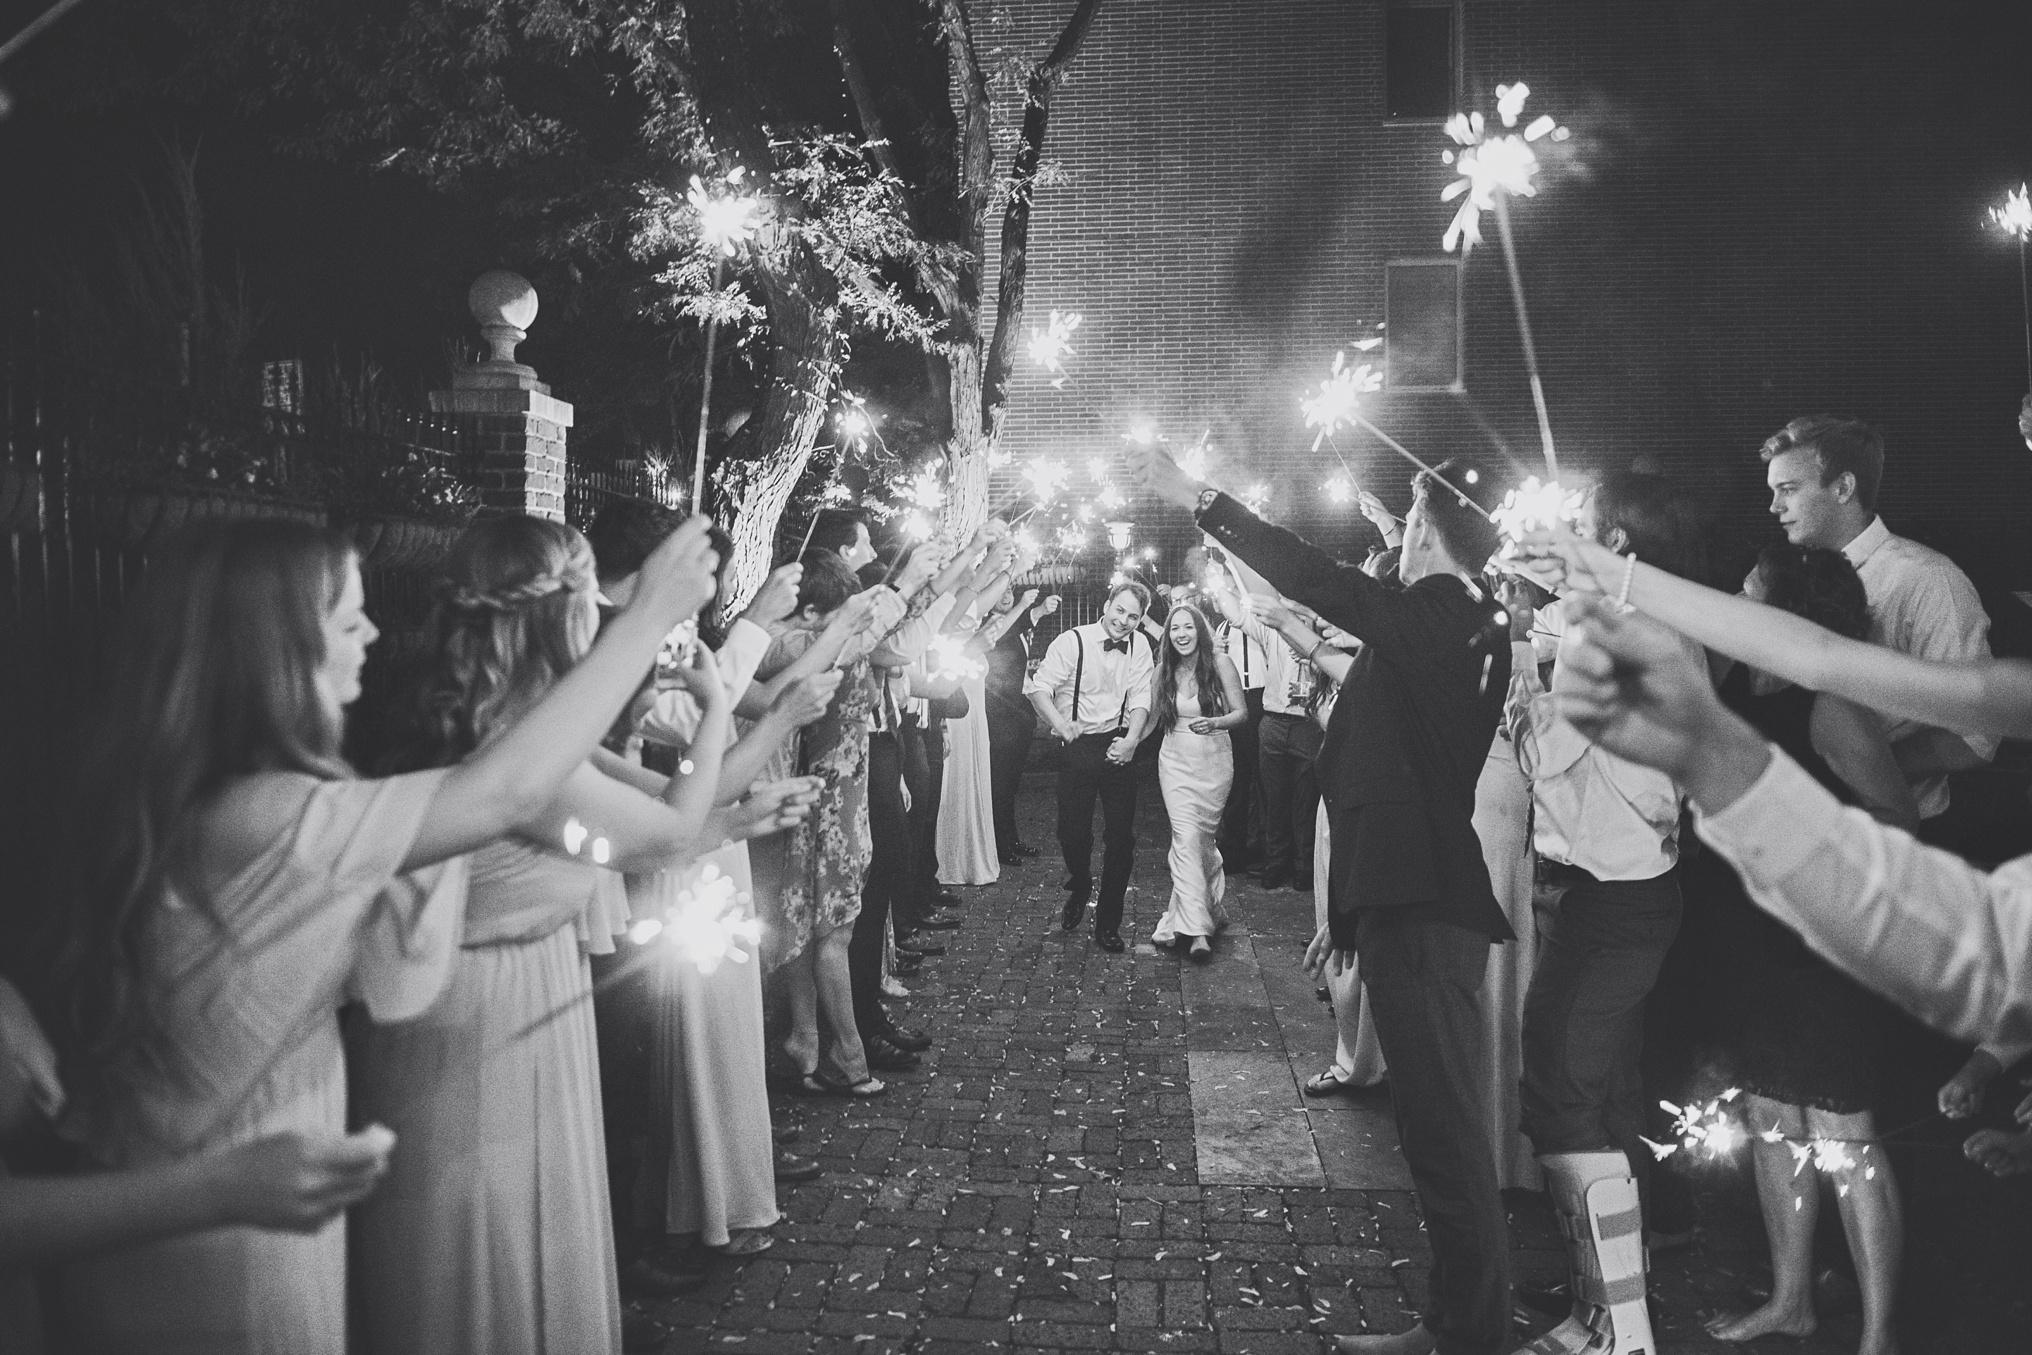 best_wedding_photography_2017_by_lucas_botz_photography_077.jpg